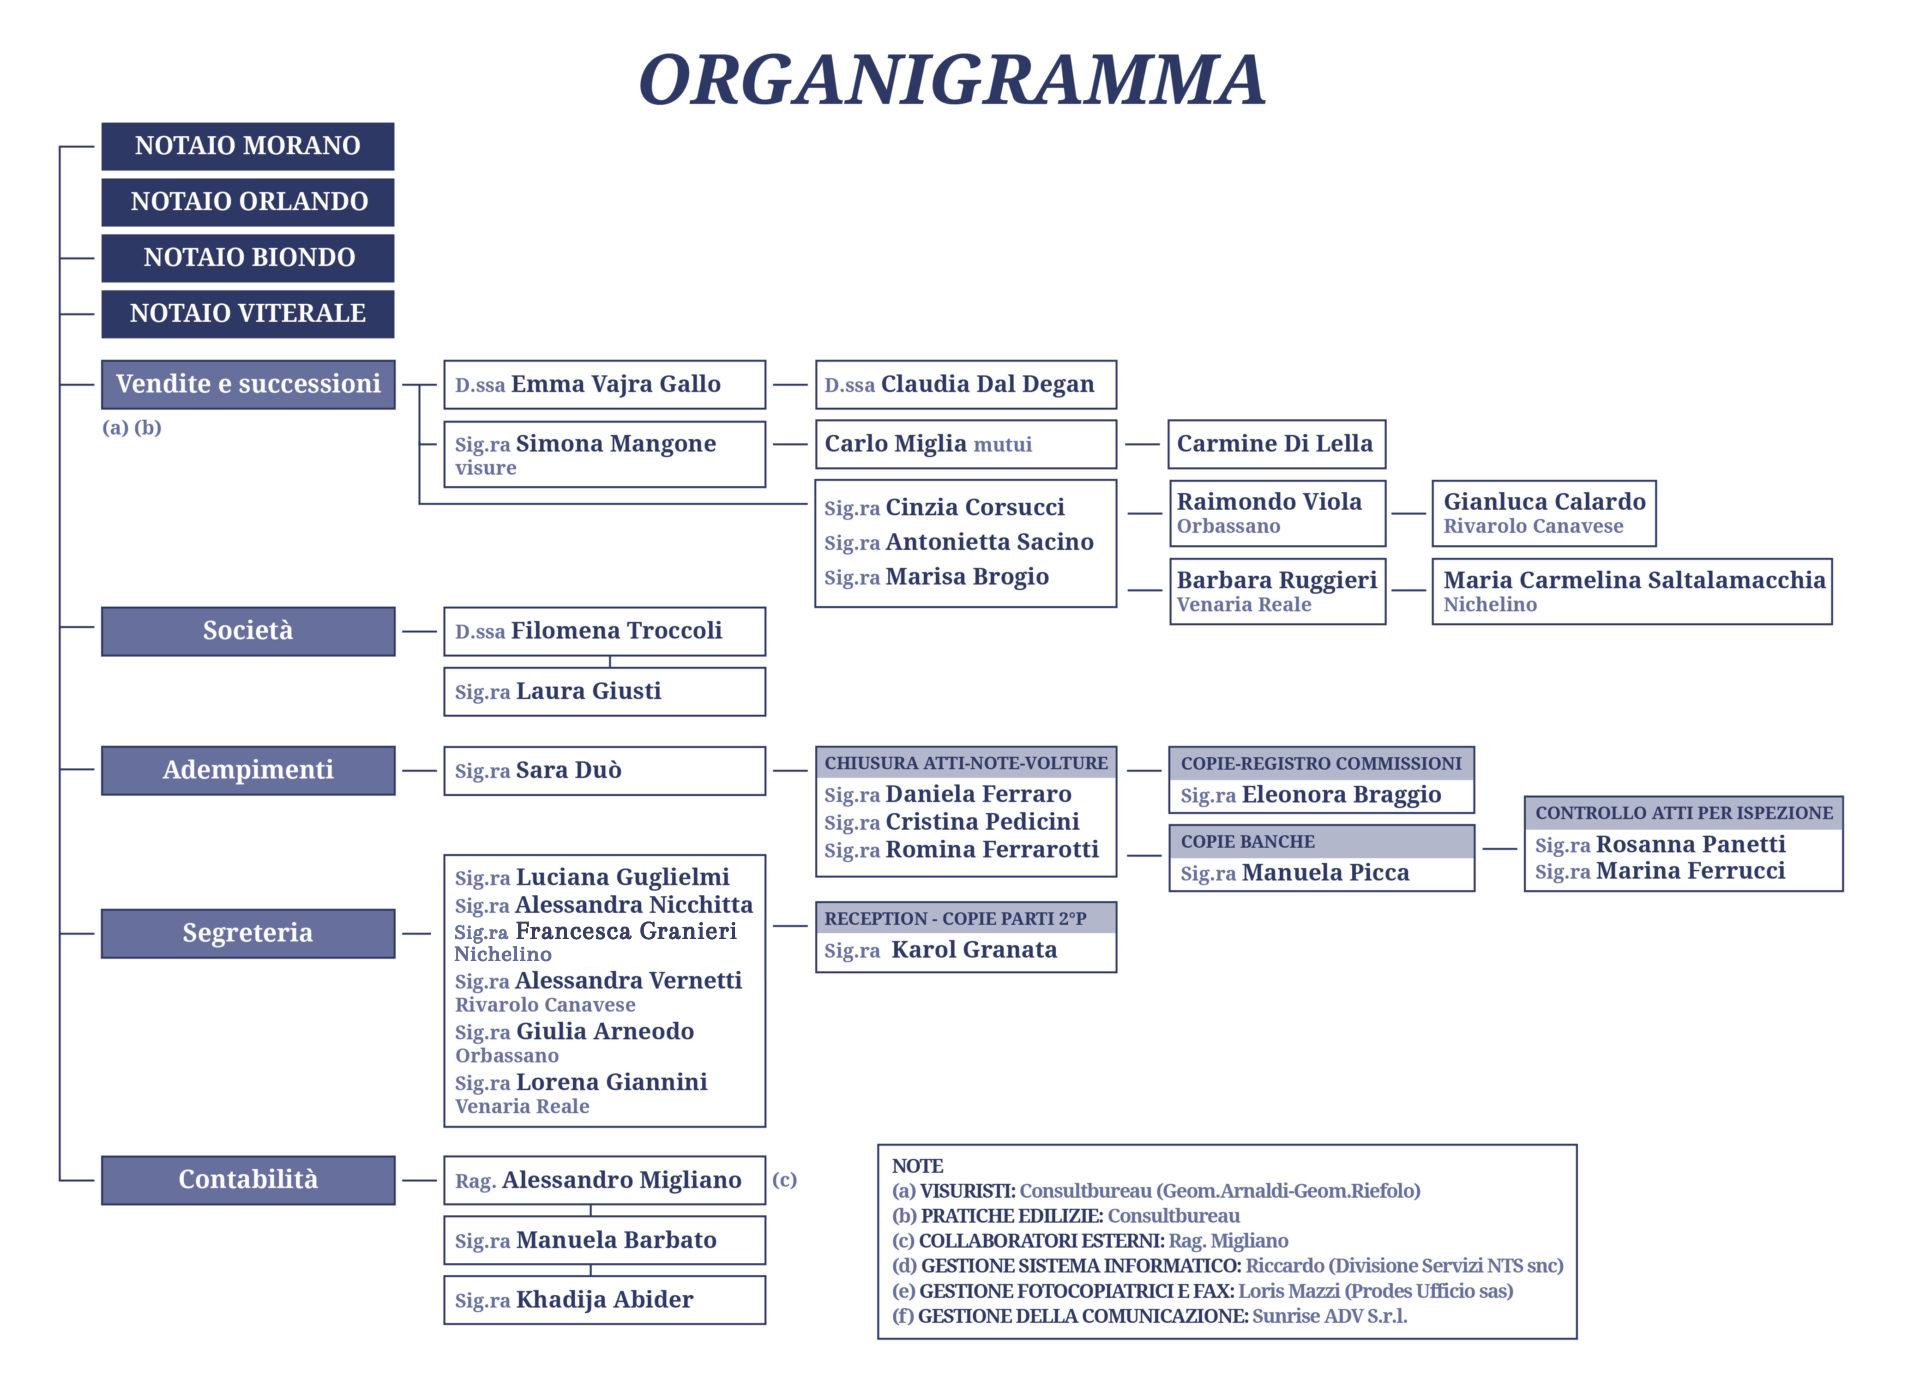 Notai Piemontesi Associati | L'organizzazione